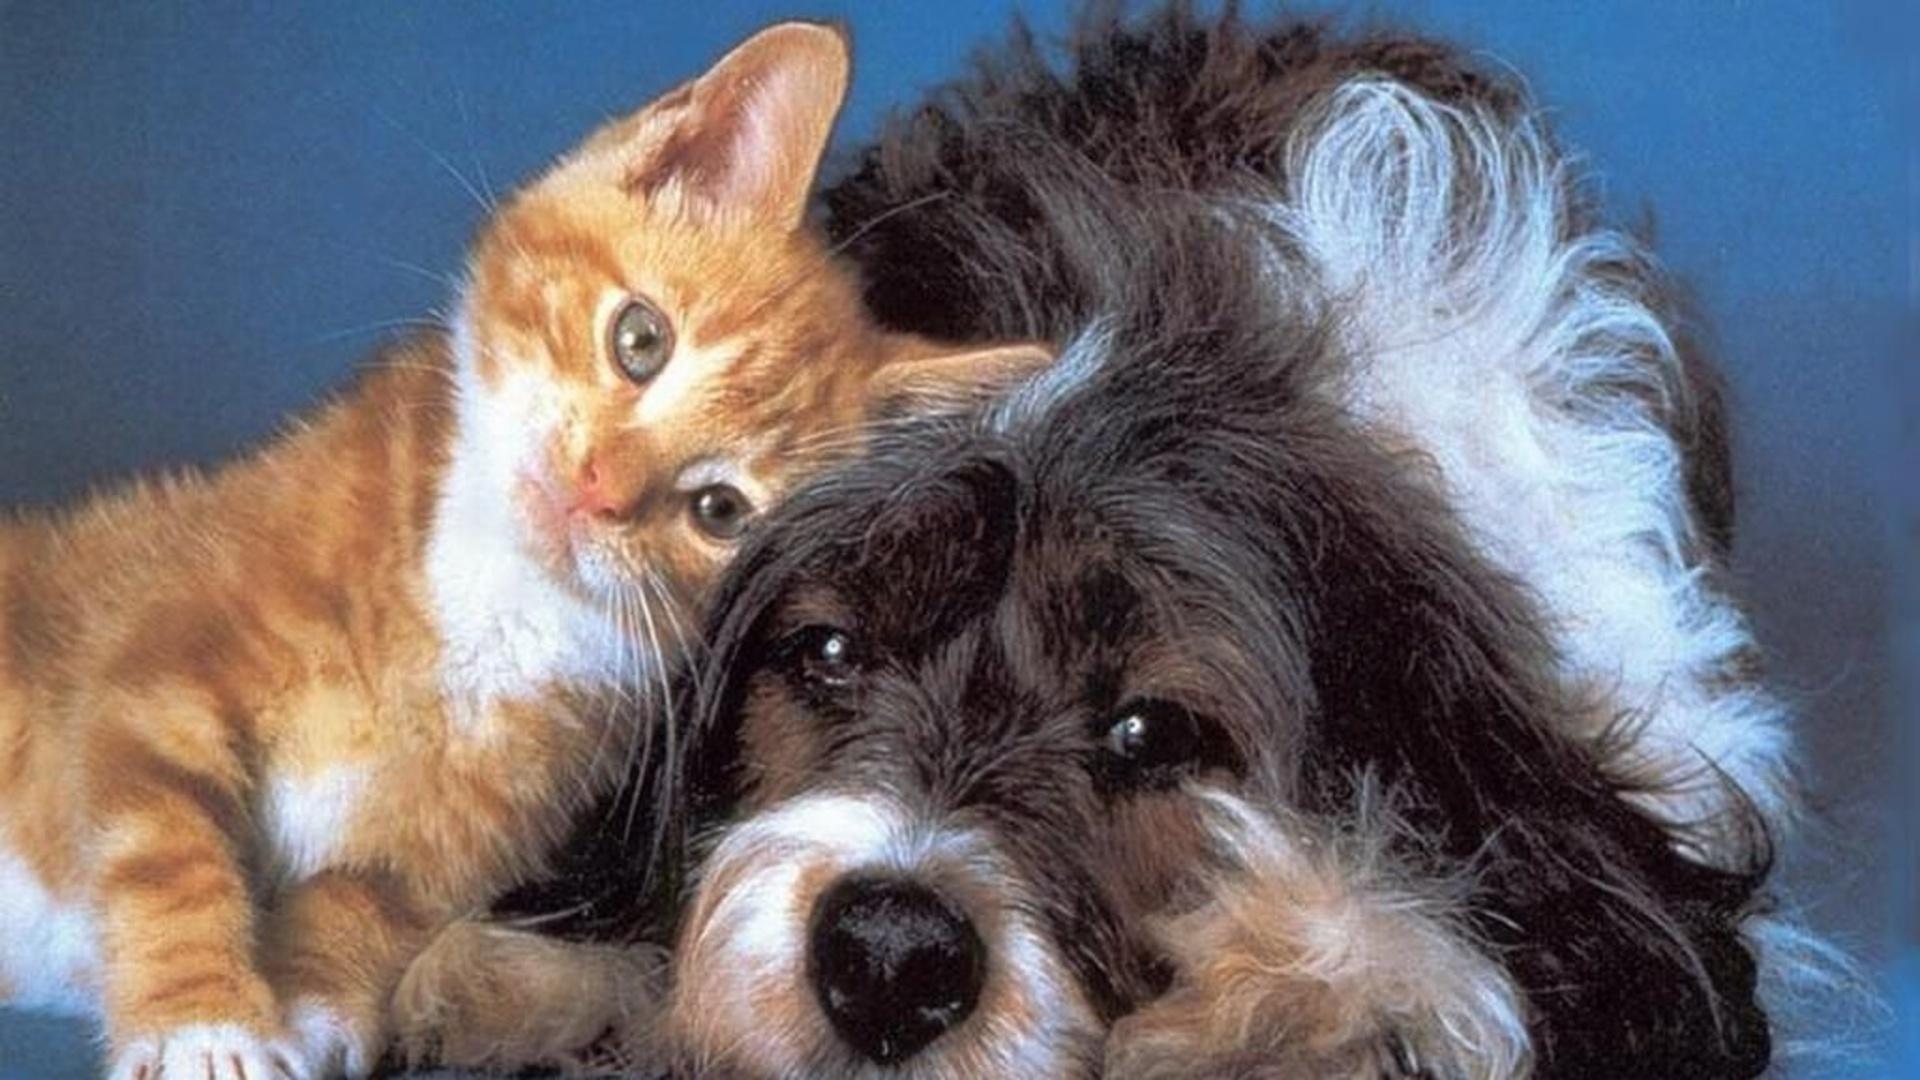 Cat & Dog Full HD Wallpaper